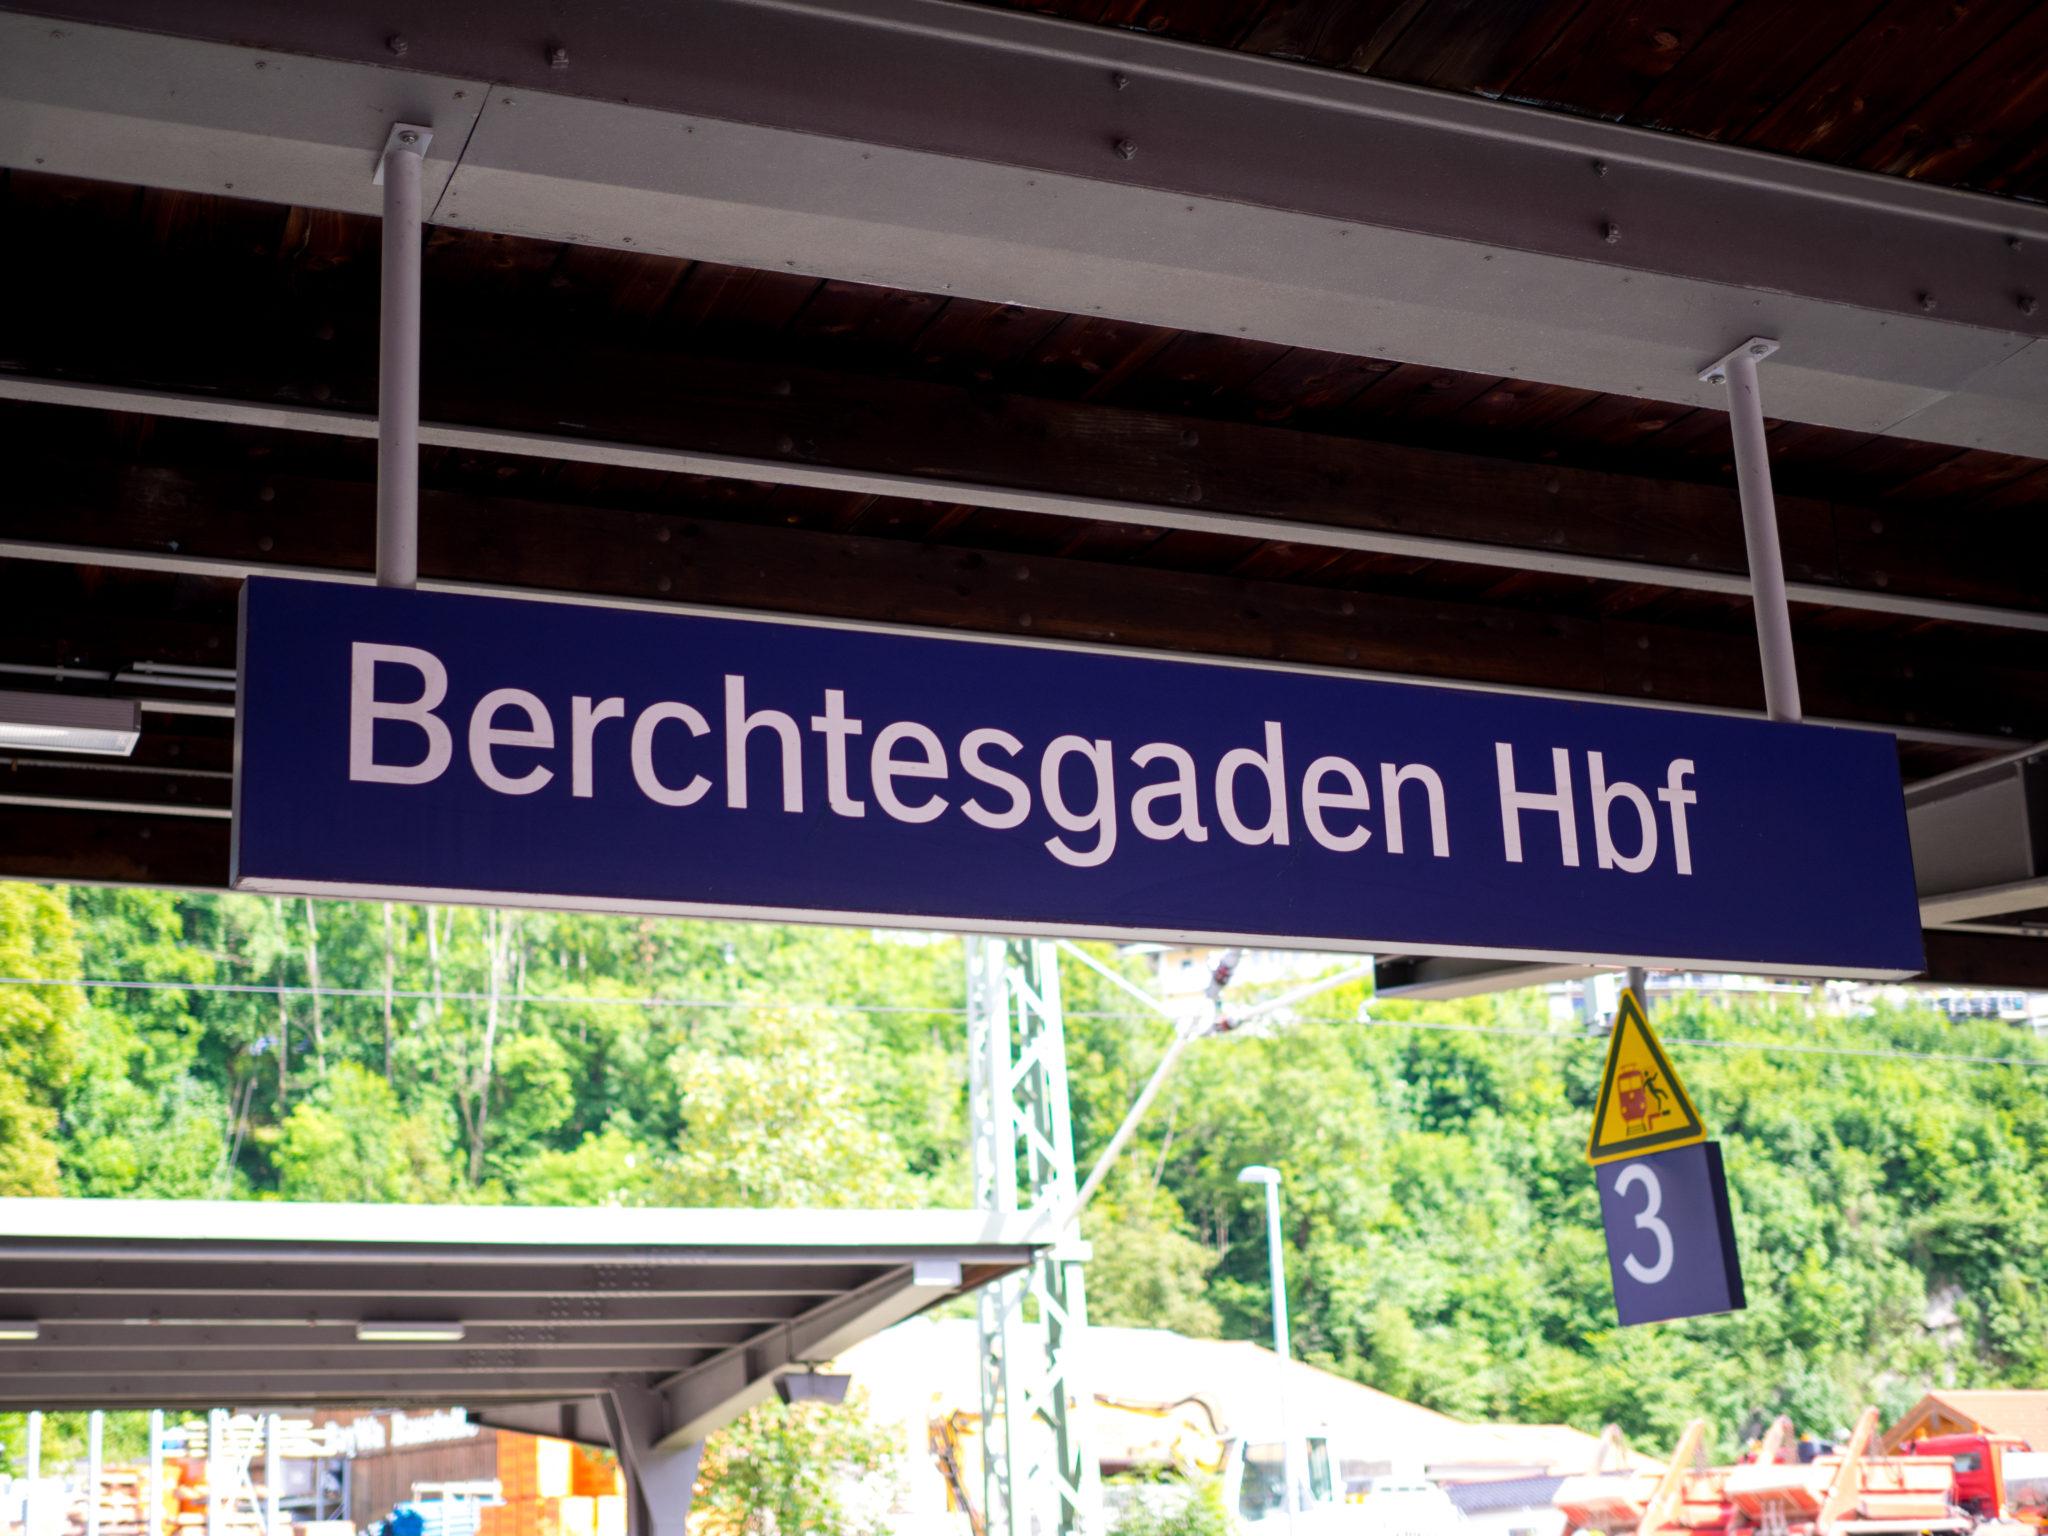 Berchtesgarden Hbf.